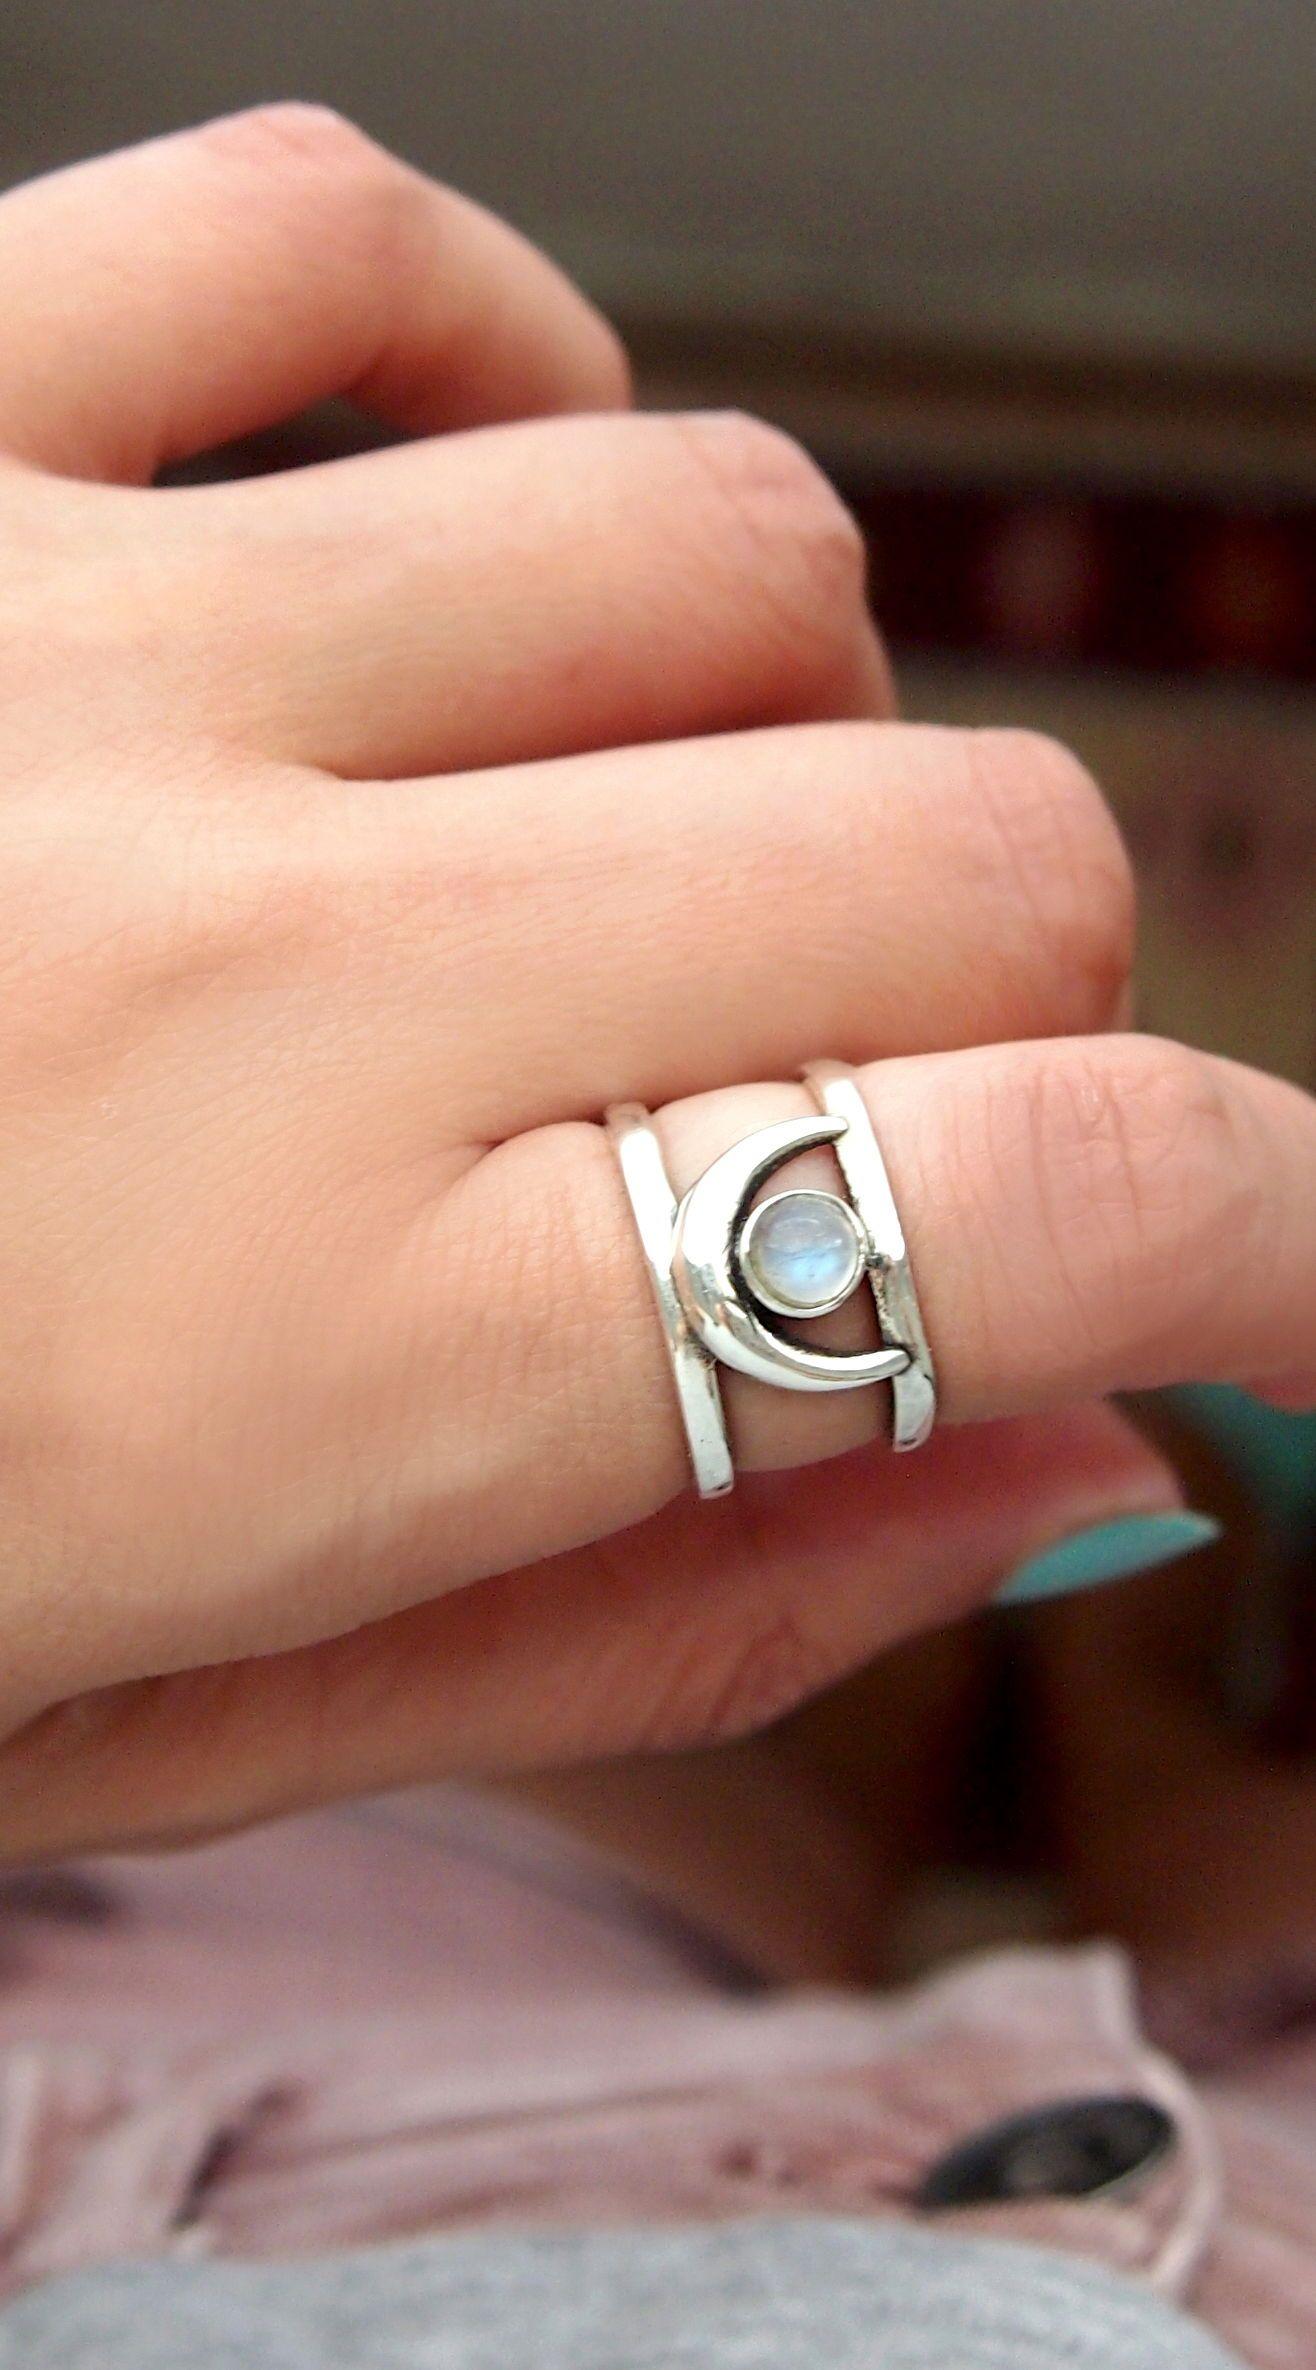 Moonstone Ring Moonstone Jewelry Blue Moonstone Ring Stone Ring Gemstone Ring Gemstone Jewelry Adjusable Ring Black Ring Rainbow Moonstone